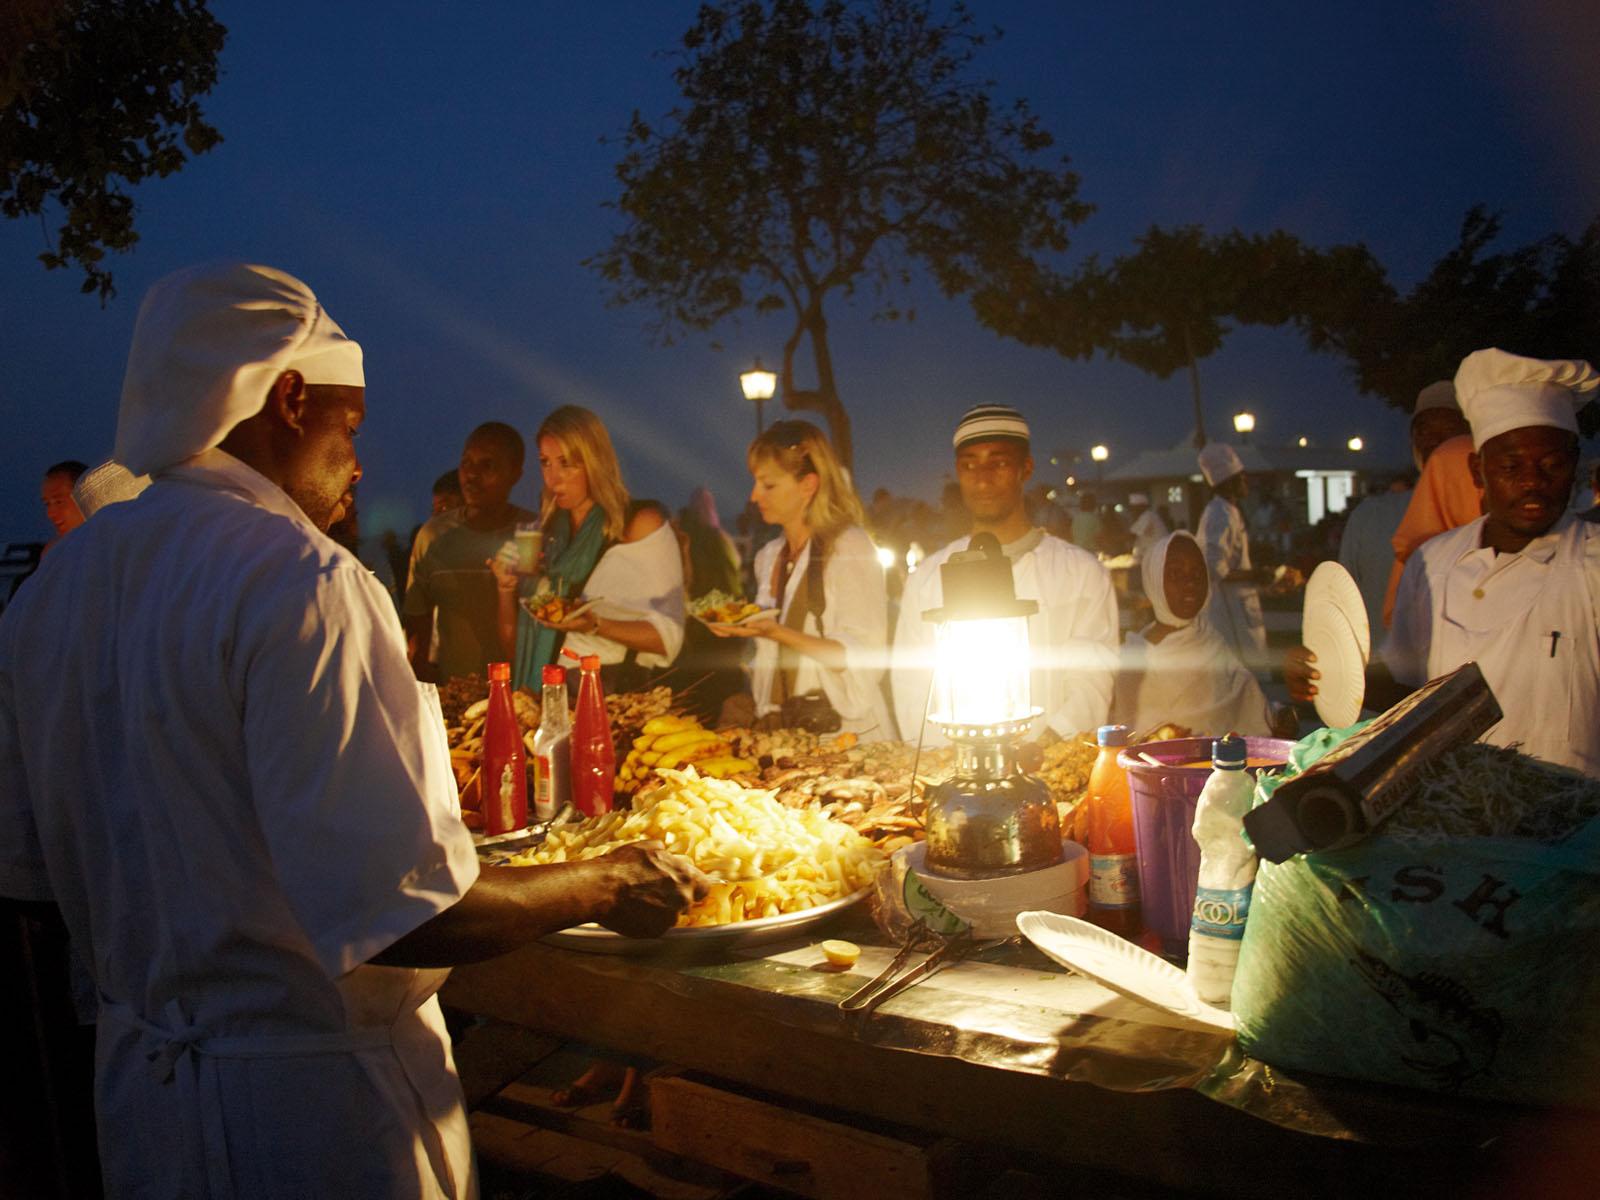 Gallery Tours & Safari - Dining-&-nightlife